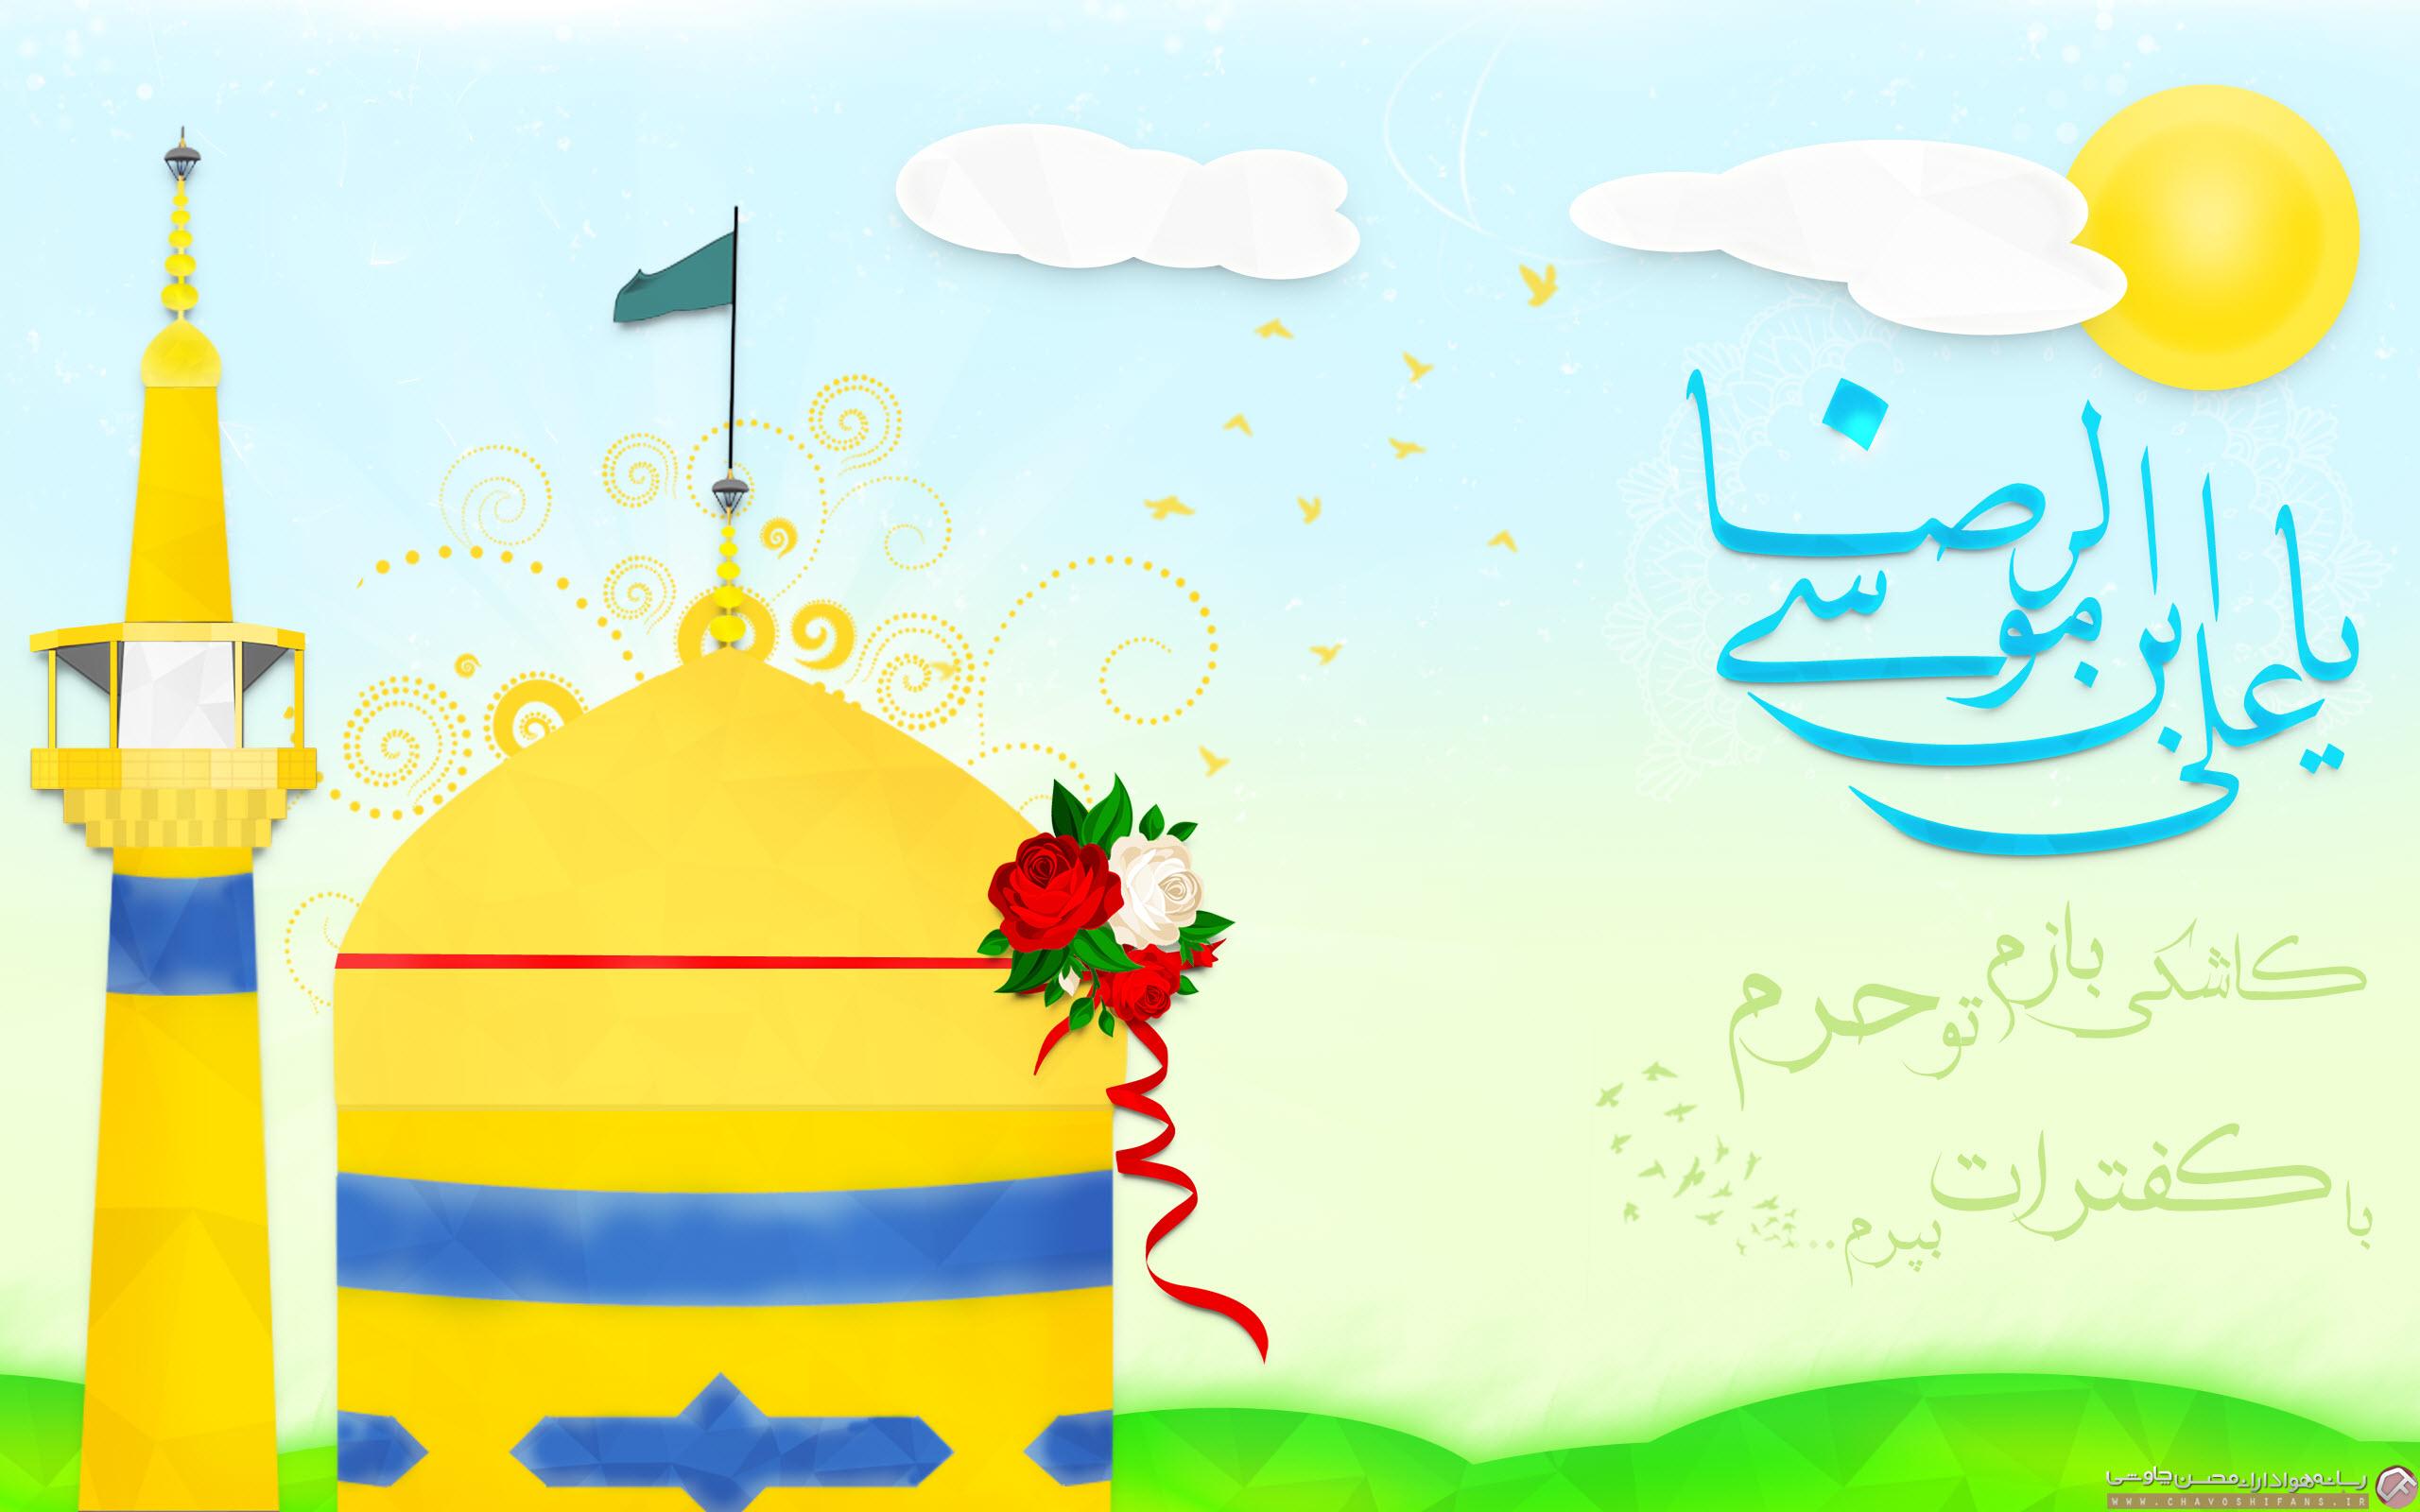 http://www.chavoshifans.ir/wp-content/uploads/2015/08/Imam-Reza-1.jpg